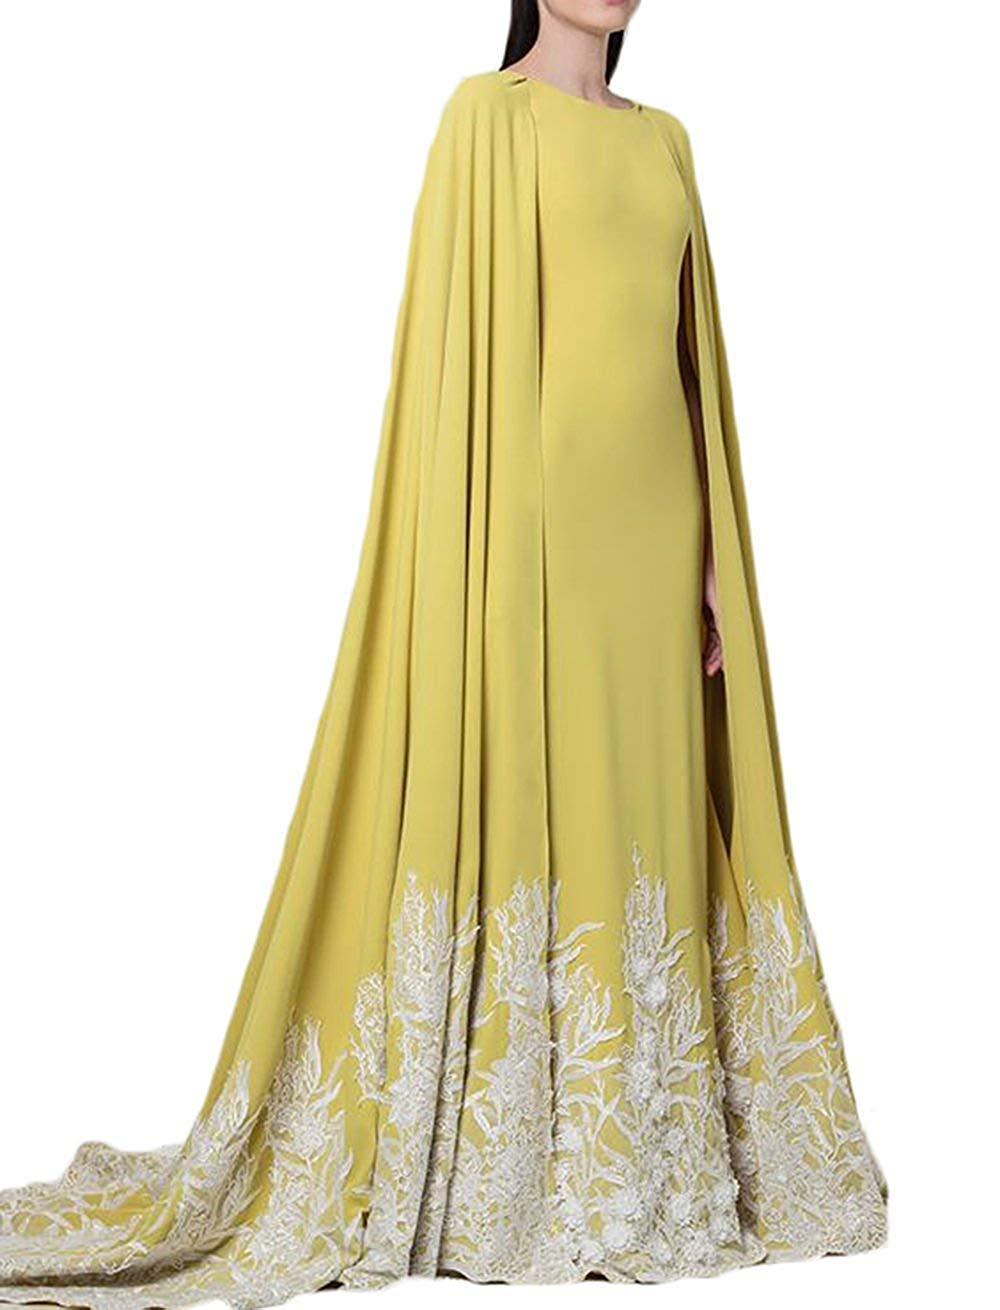 Women Long   Bridesmaid     Dresses   Sleeveless Satin Wedding Party   Dresses   2019 New Arrivals